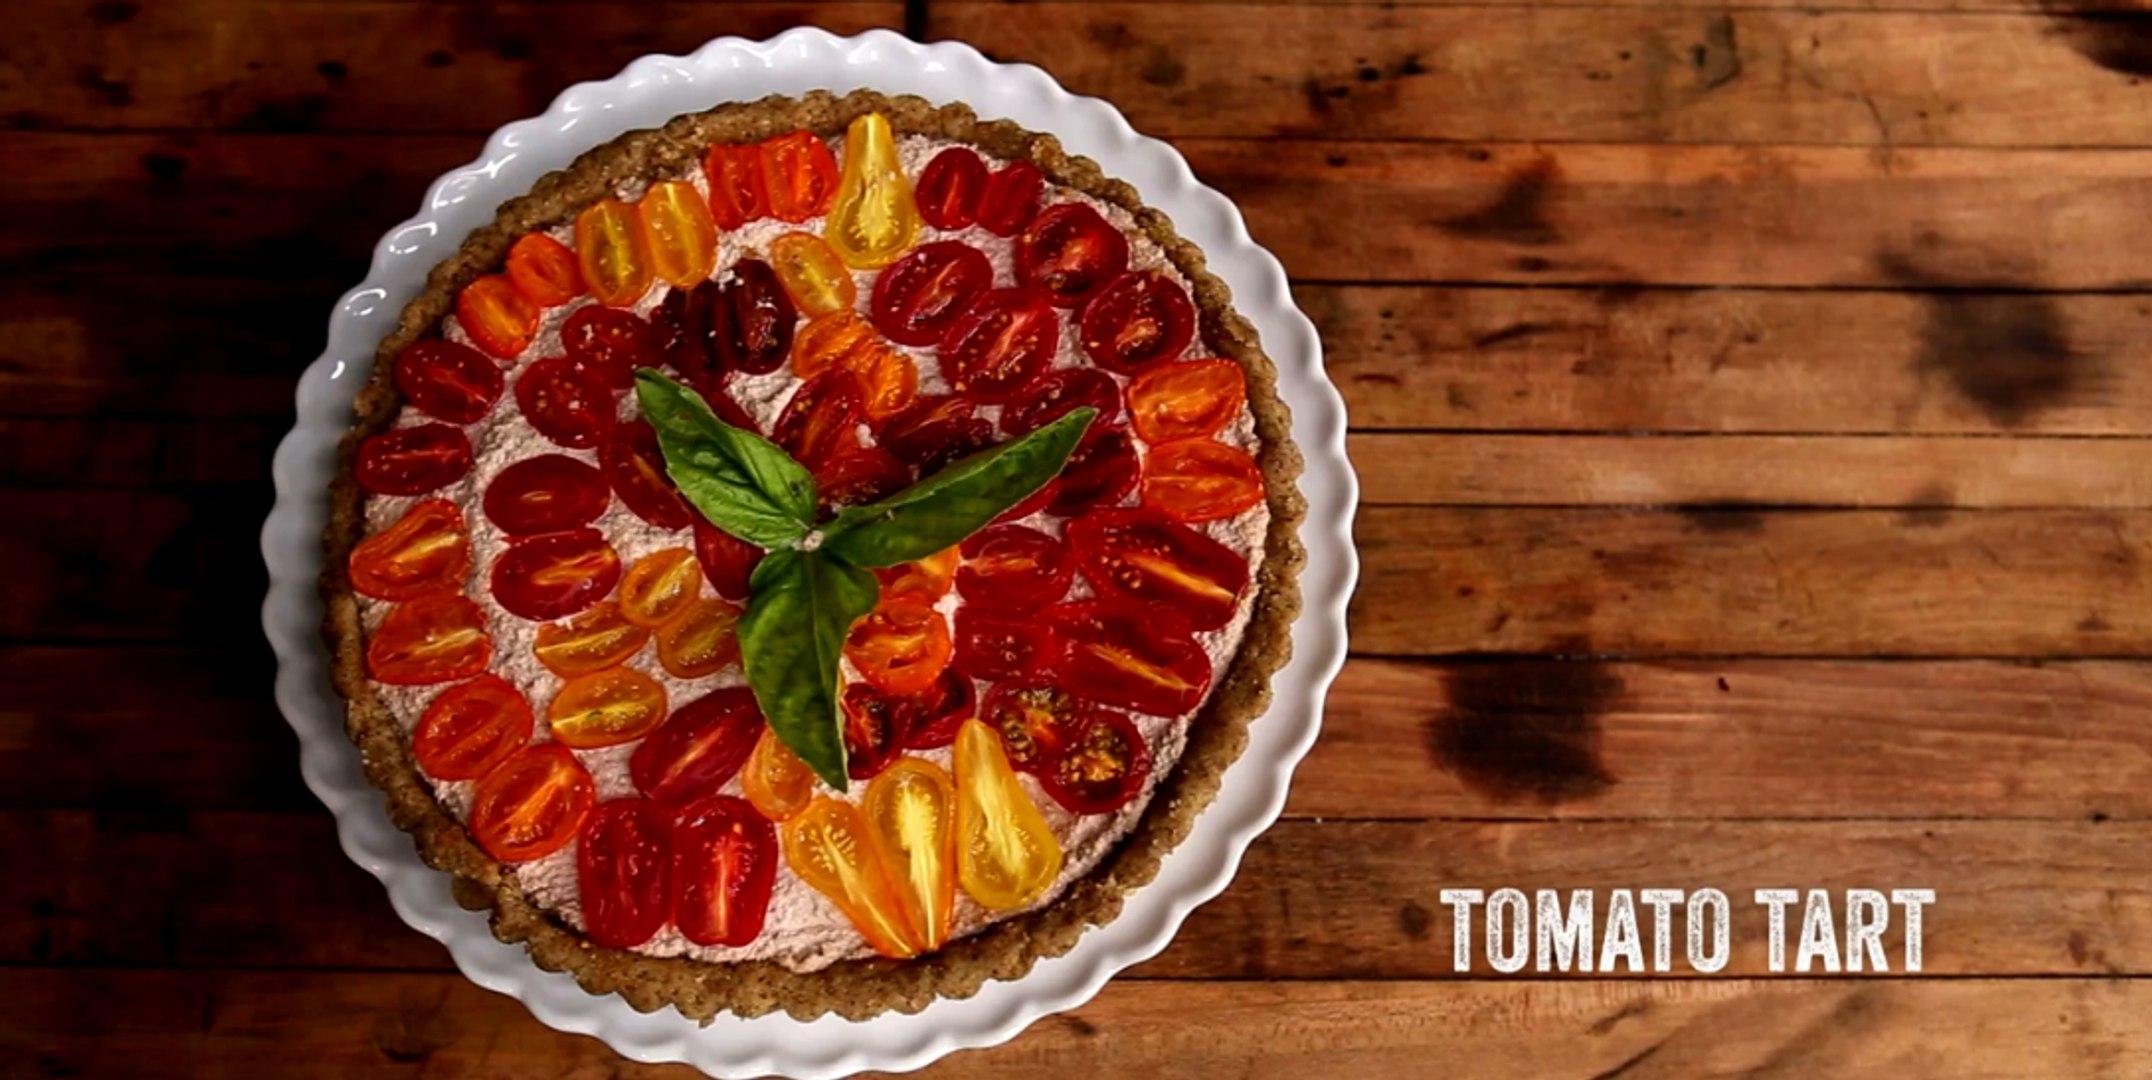 VEGAN TOMATO TART - Raw. Vegan. Not Gross